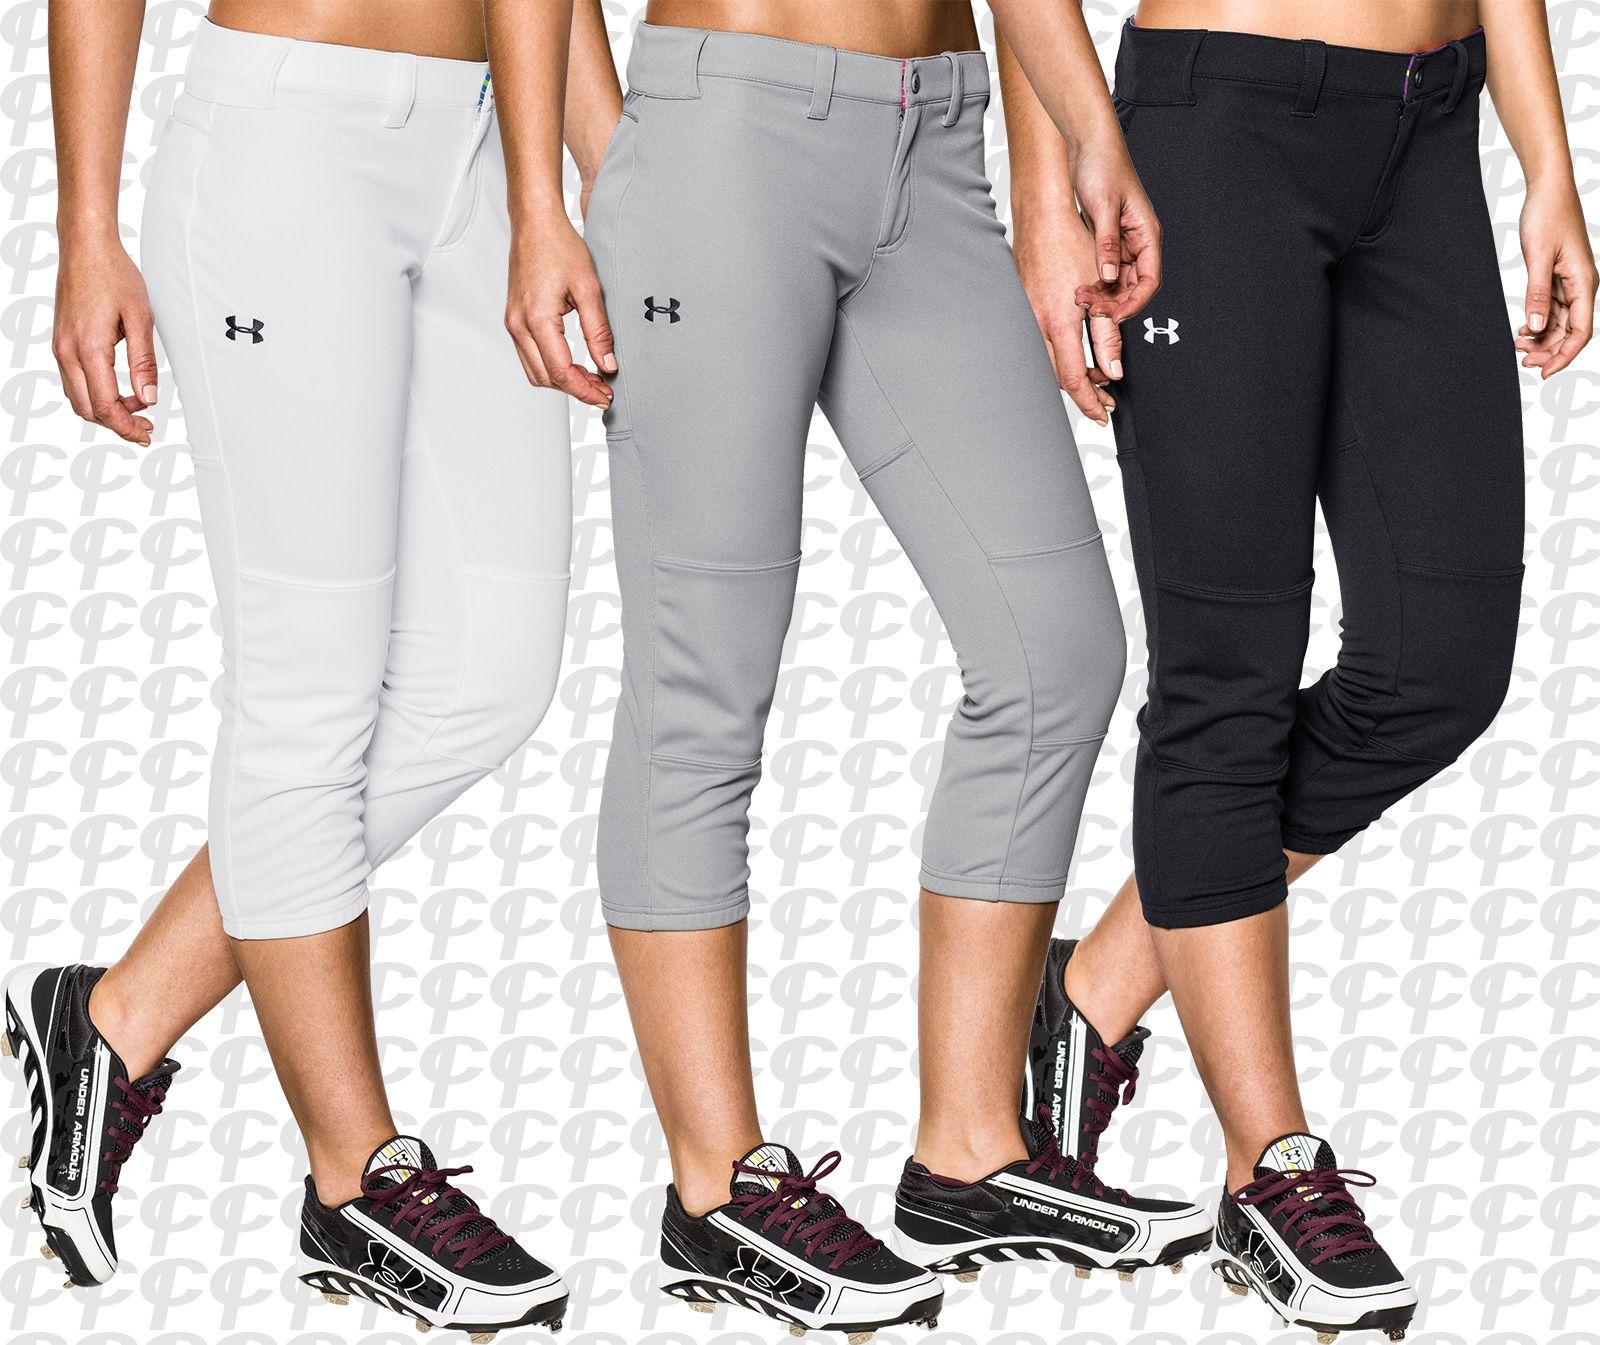 be711e977bd21 Under Armour HeatGear Strike Zone Women's Fastpitch Softball Pants Black,  White & Gray